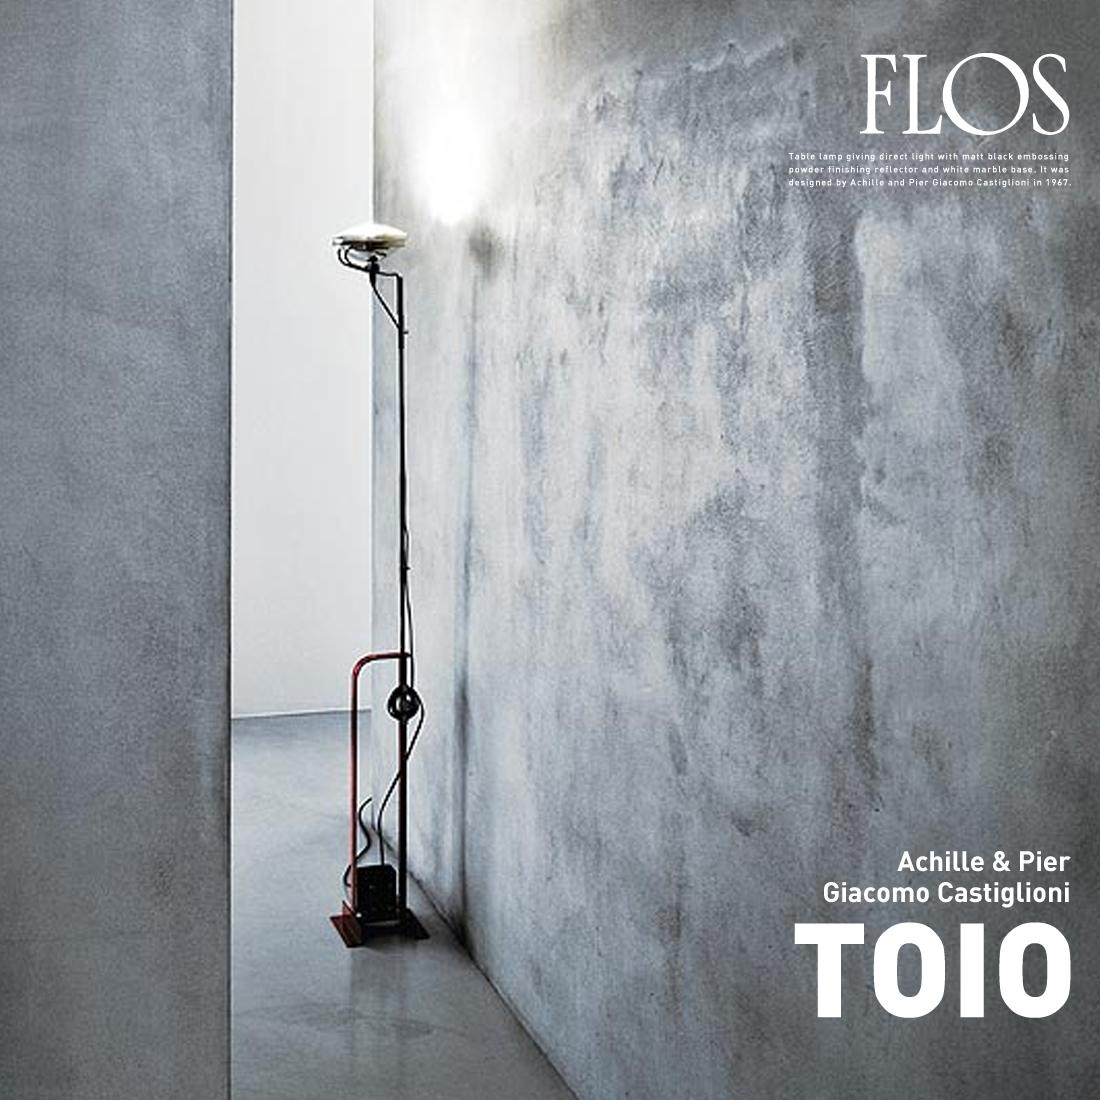 FLOS Toio フロアランプAchille & Pier Giacomo Castiglioni アキッレ・ジャコモ・カスティリオーニフロアランプ ライト スタンドライト